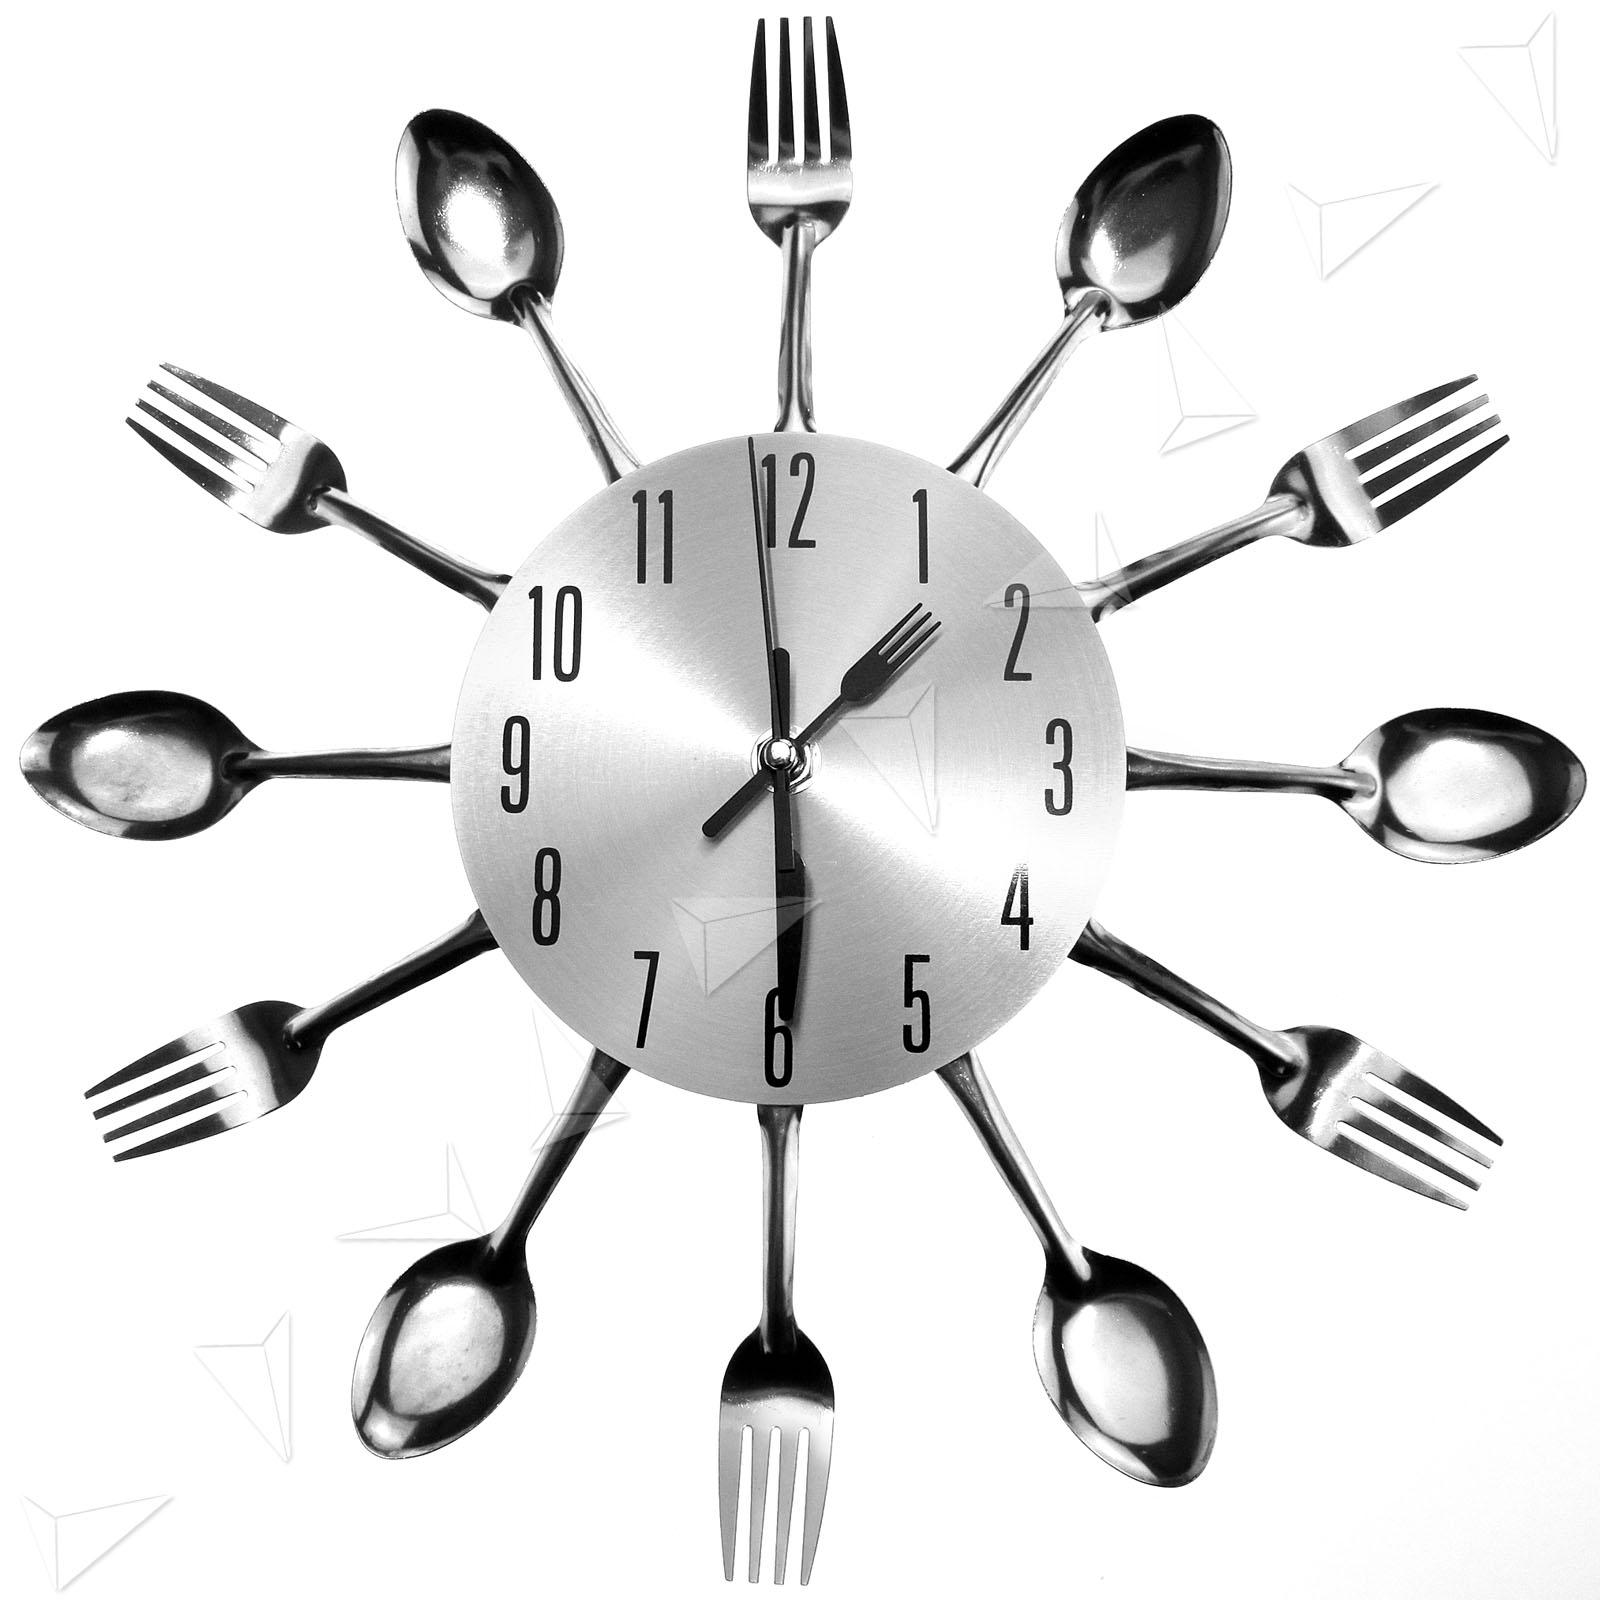 Uniquebella Metal Kitchen Cutlery Utensil Wall Clock Spoon: Modern Design Sliver Cutlery Kitchen Utensil Wall Clock